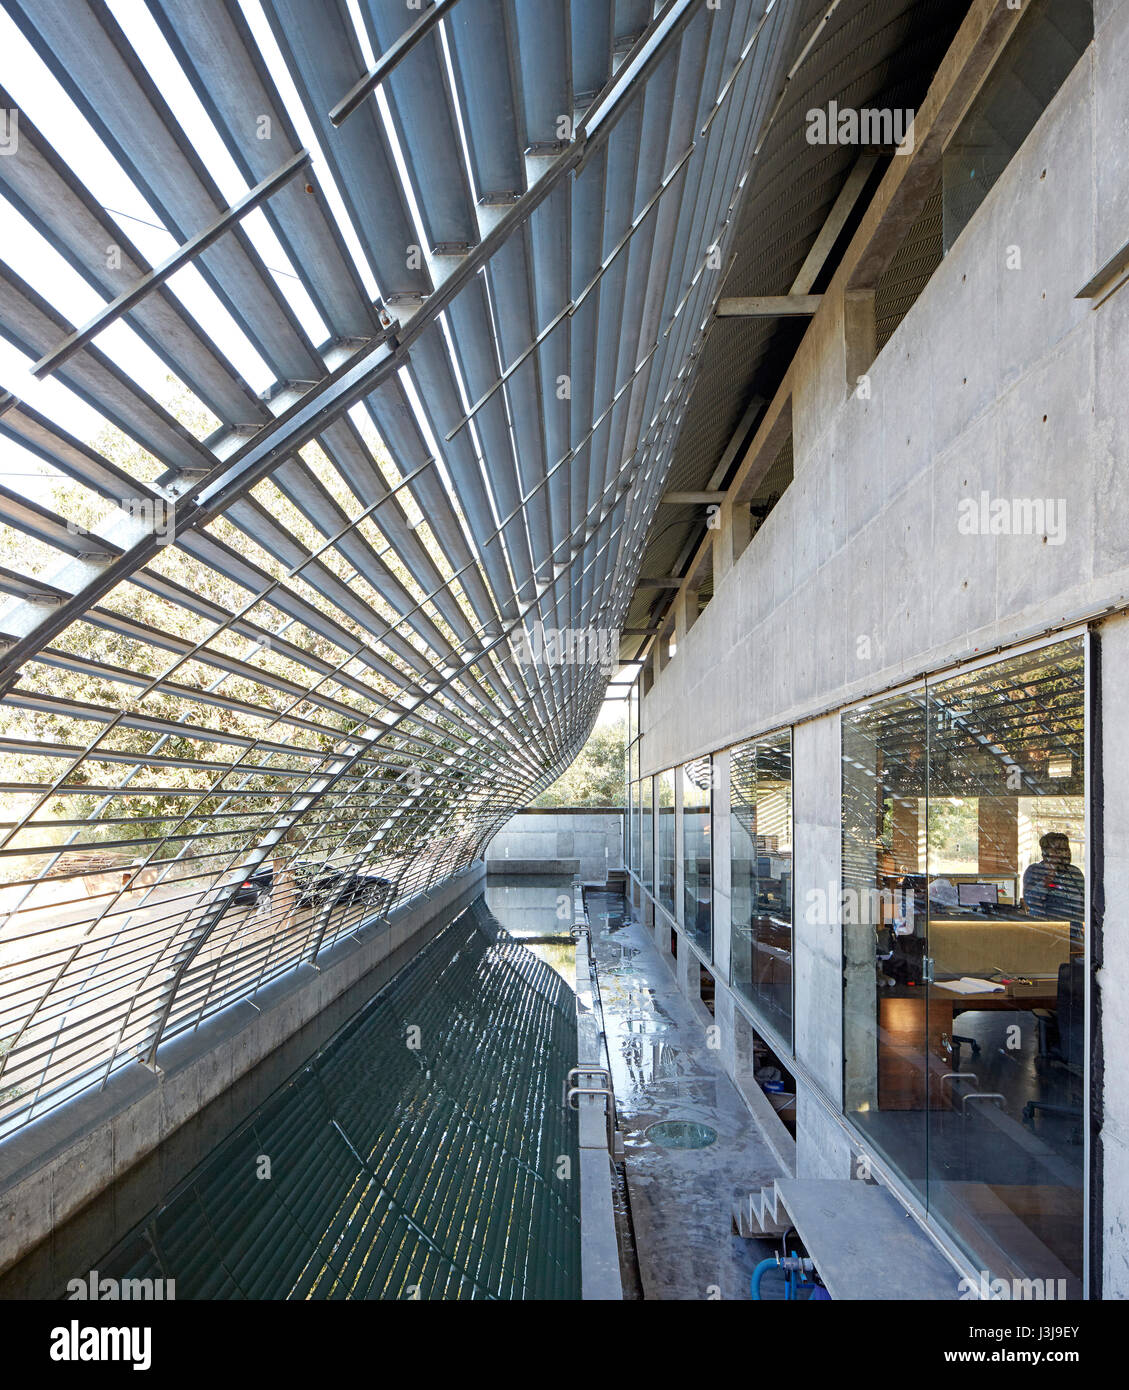 Entrance area under steel canopy with pool. The Pool Studio of Matharoo Associates, Ahmedabad, India. Architect: Stock Photo